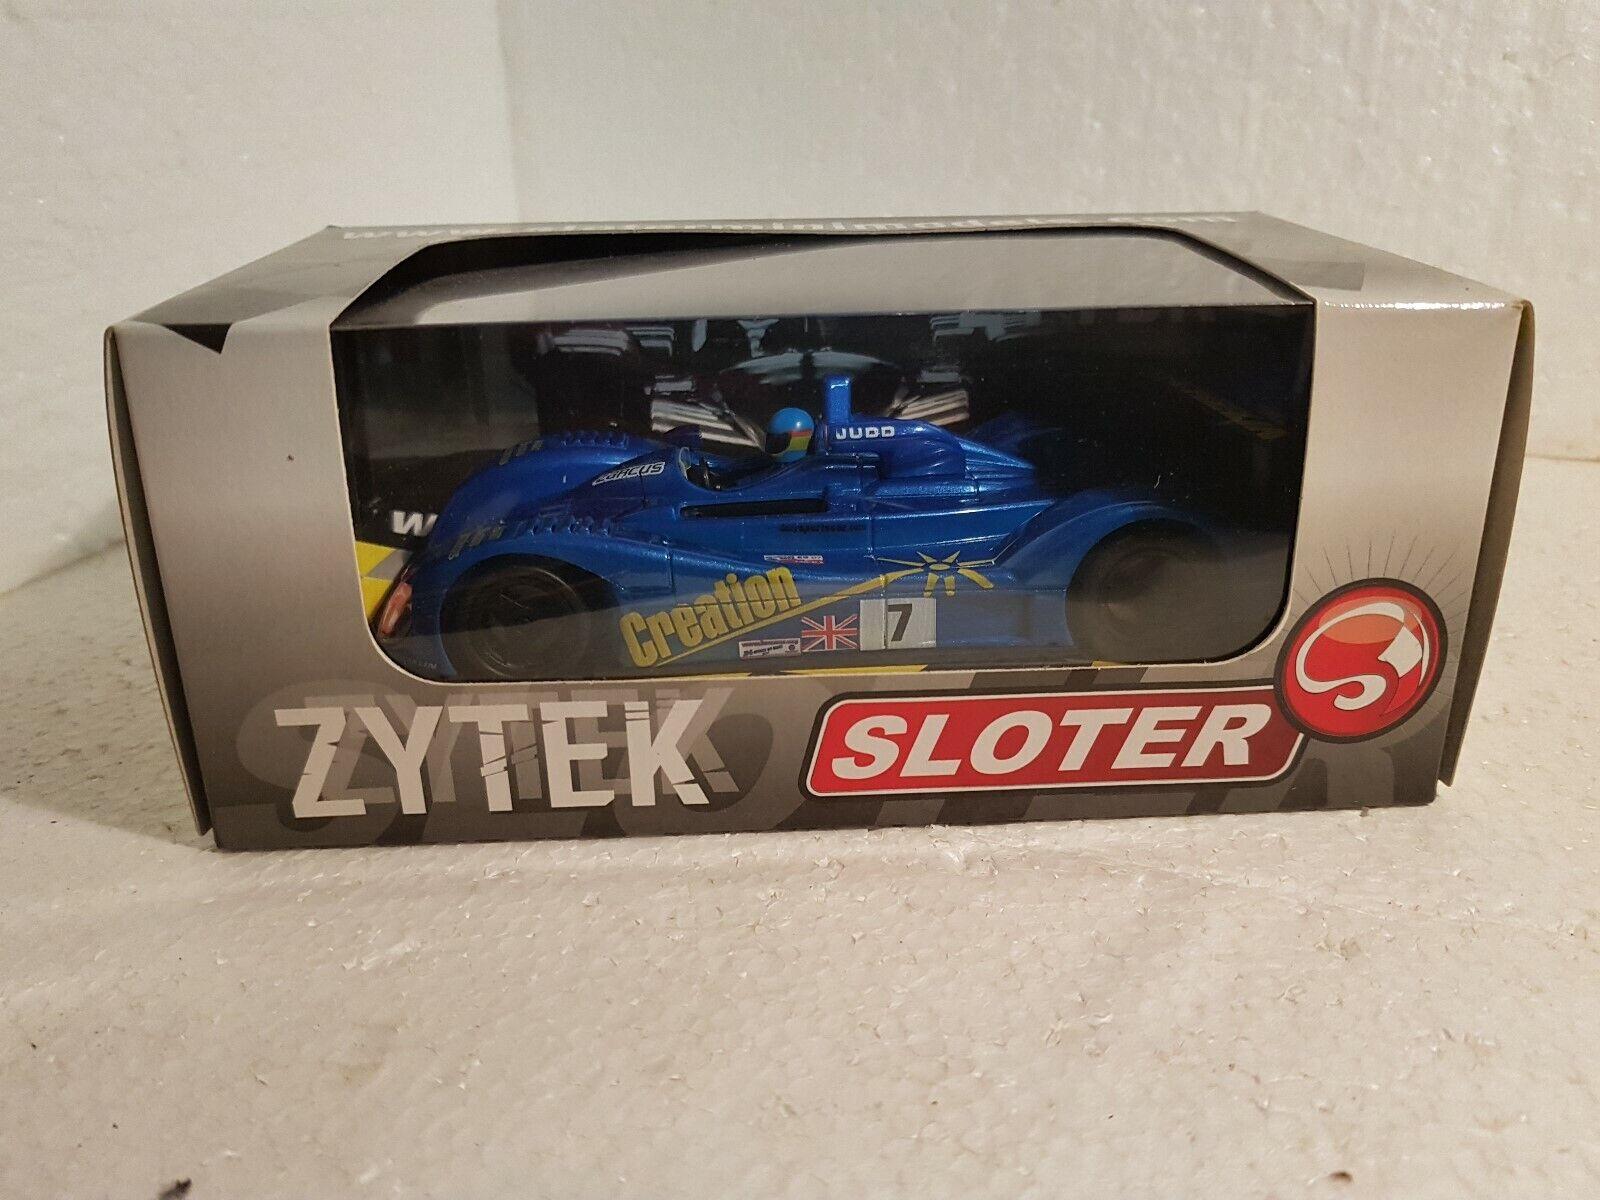 QQ 9503 Sloter Zytek Team Creation Le Mans 2005  7 Minassian (Magnet)